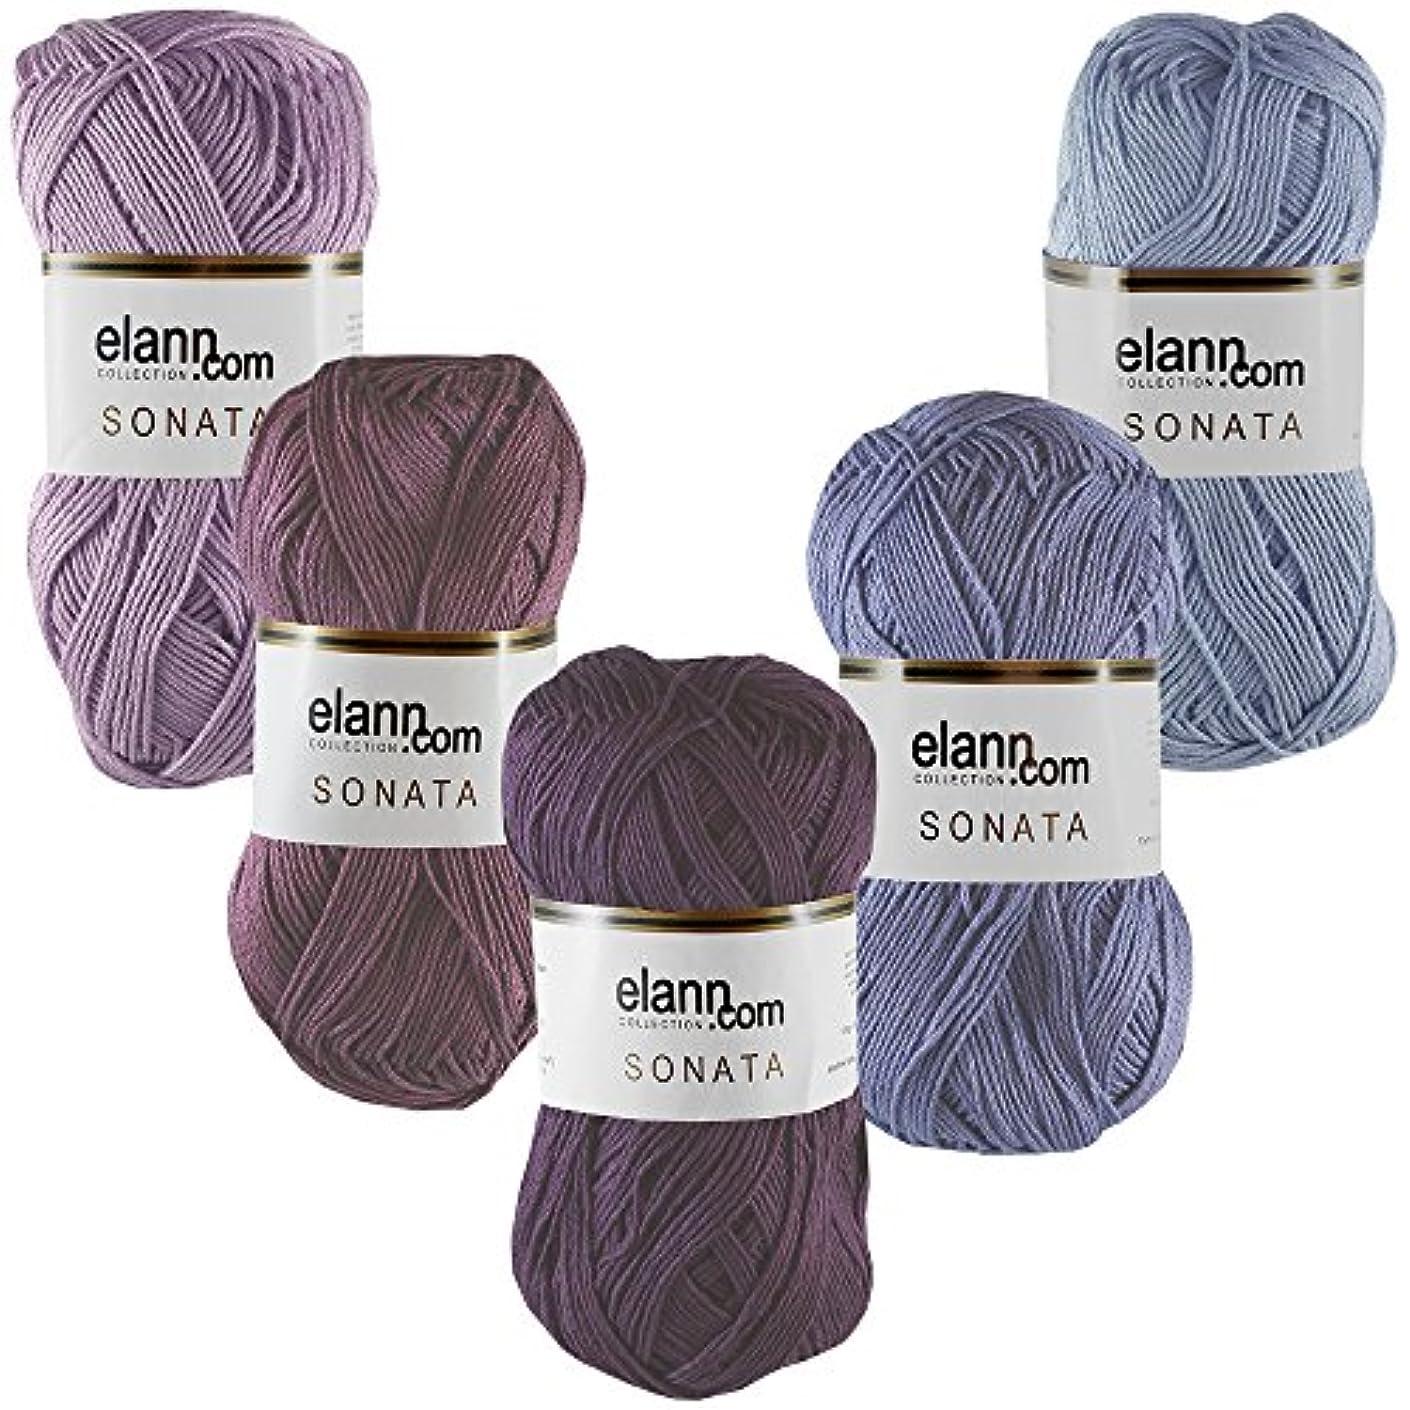 elann Sonata Yarn | 5 Ball Bag | Color Pack 3 - Plum Perfection